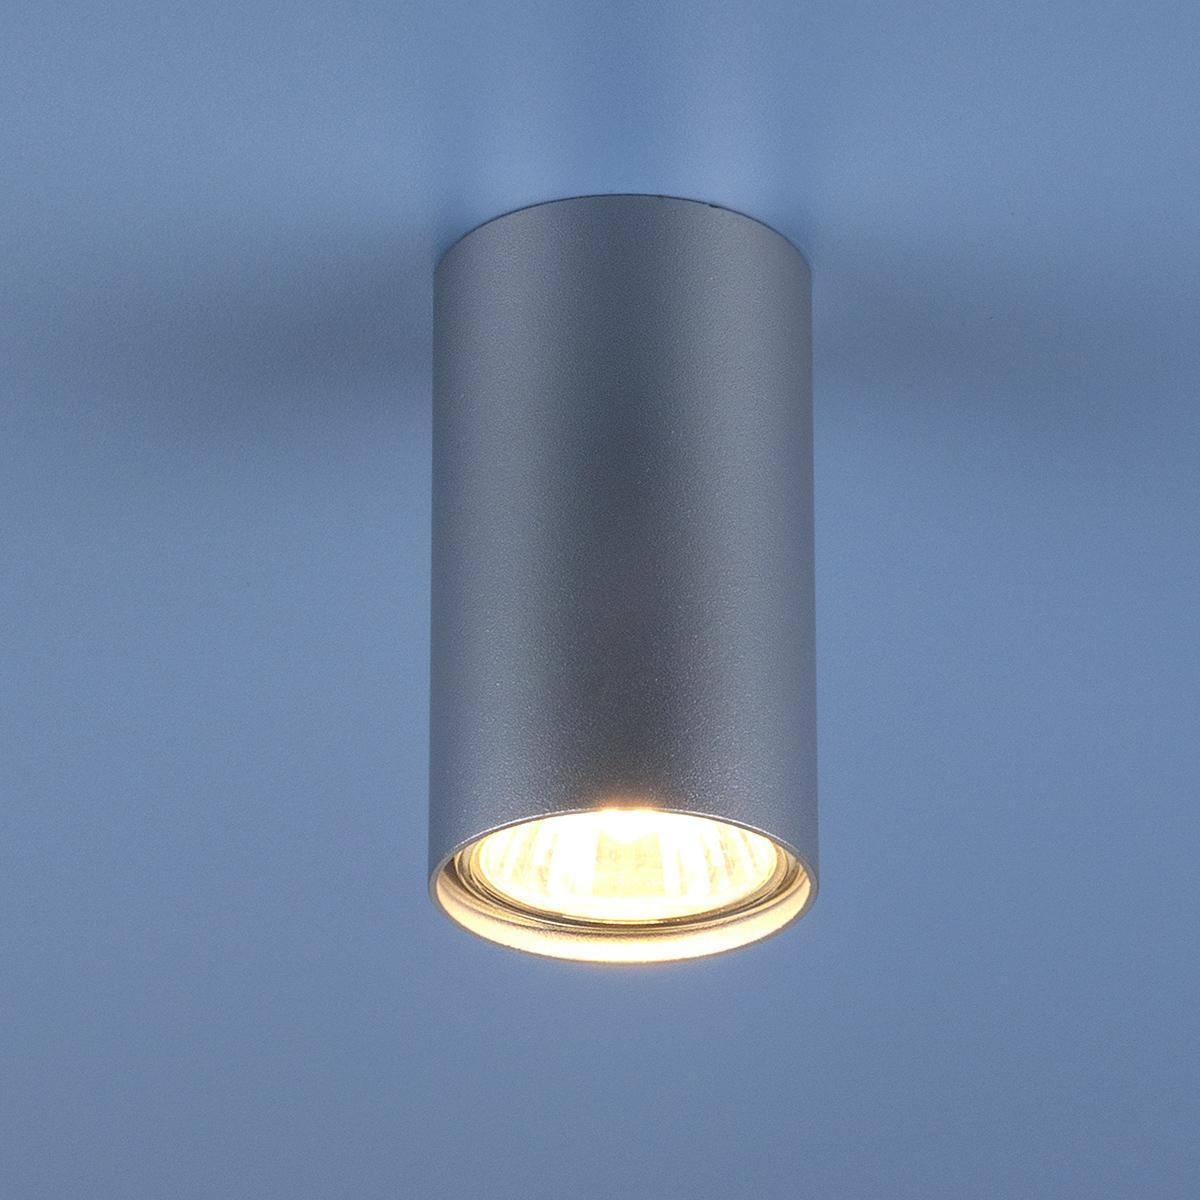 1081 GU10 SL серебро (5257)